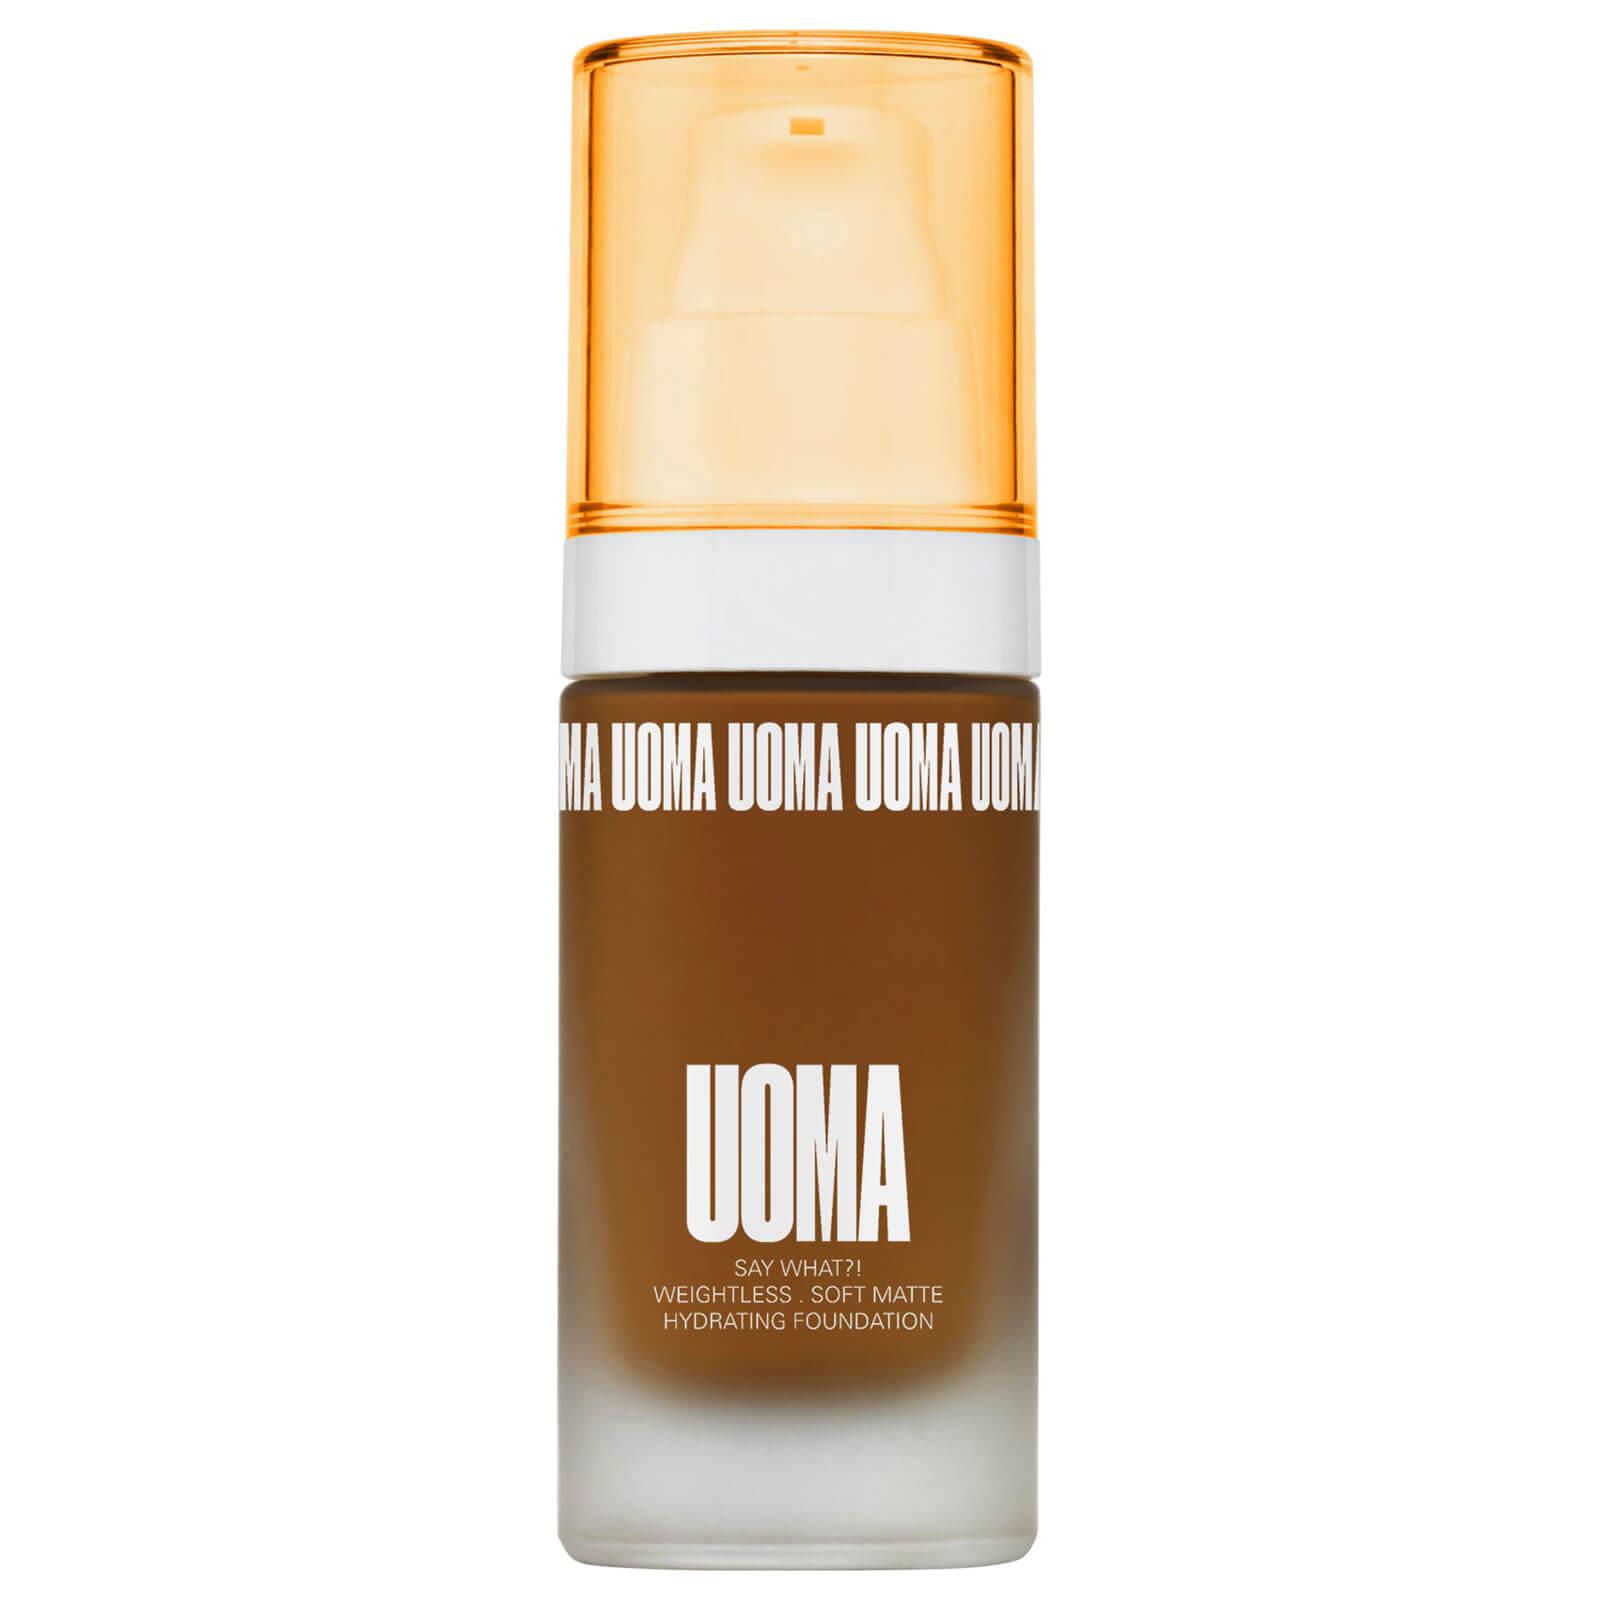 Купить UOMA Beauty Say What Foundation 30ml (Various Shades) - Brown Sugar T4W